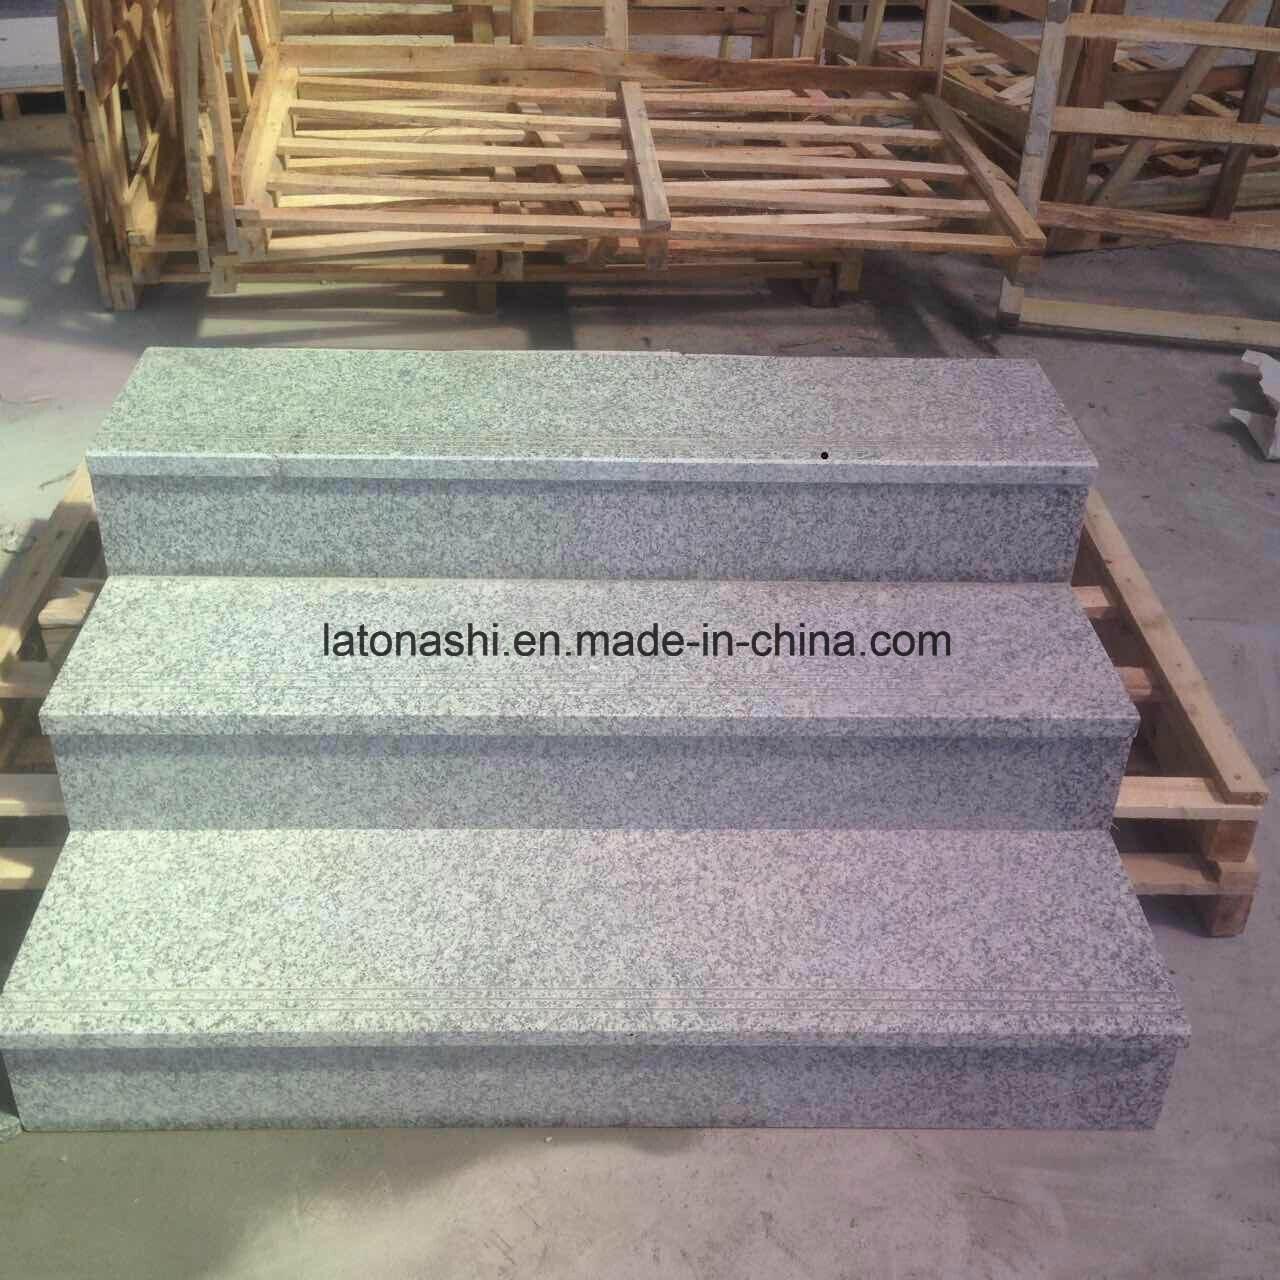 China Light Grey Granite Full Bullnose Outdoor Stair Steps Tread | Wood Stair Treads Lowes | Outdoor Stair | Deck | Stair Stringer | Handrail | Flooring